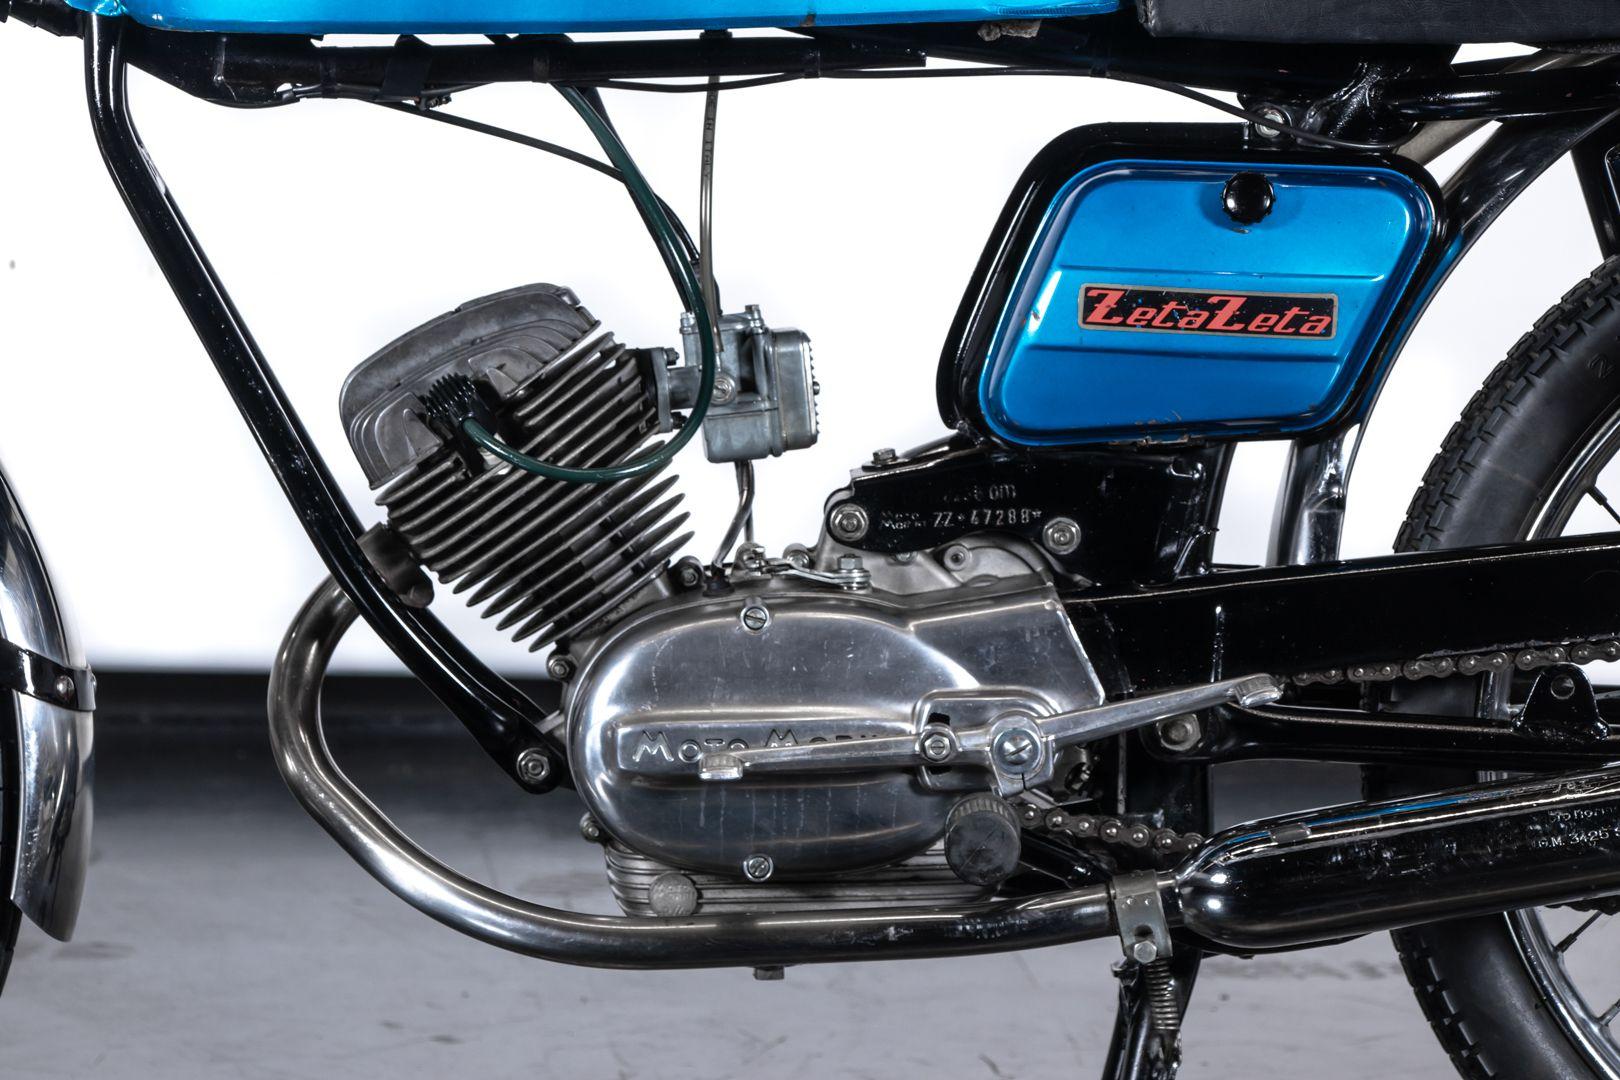 1975 Moto Morini Corsarino ZZ 77774